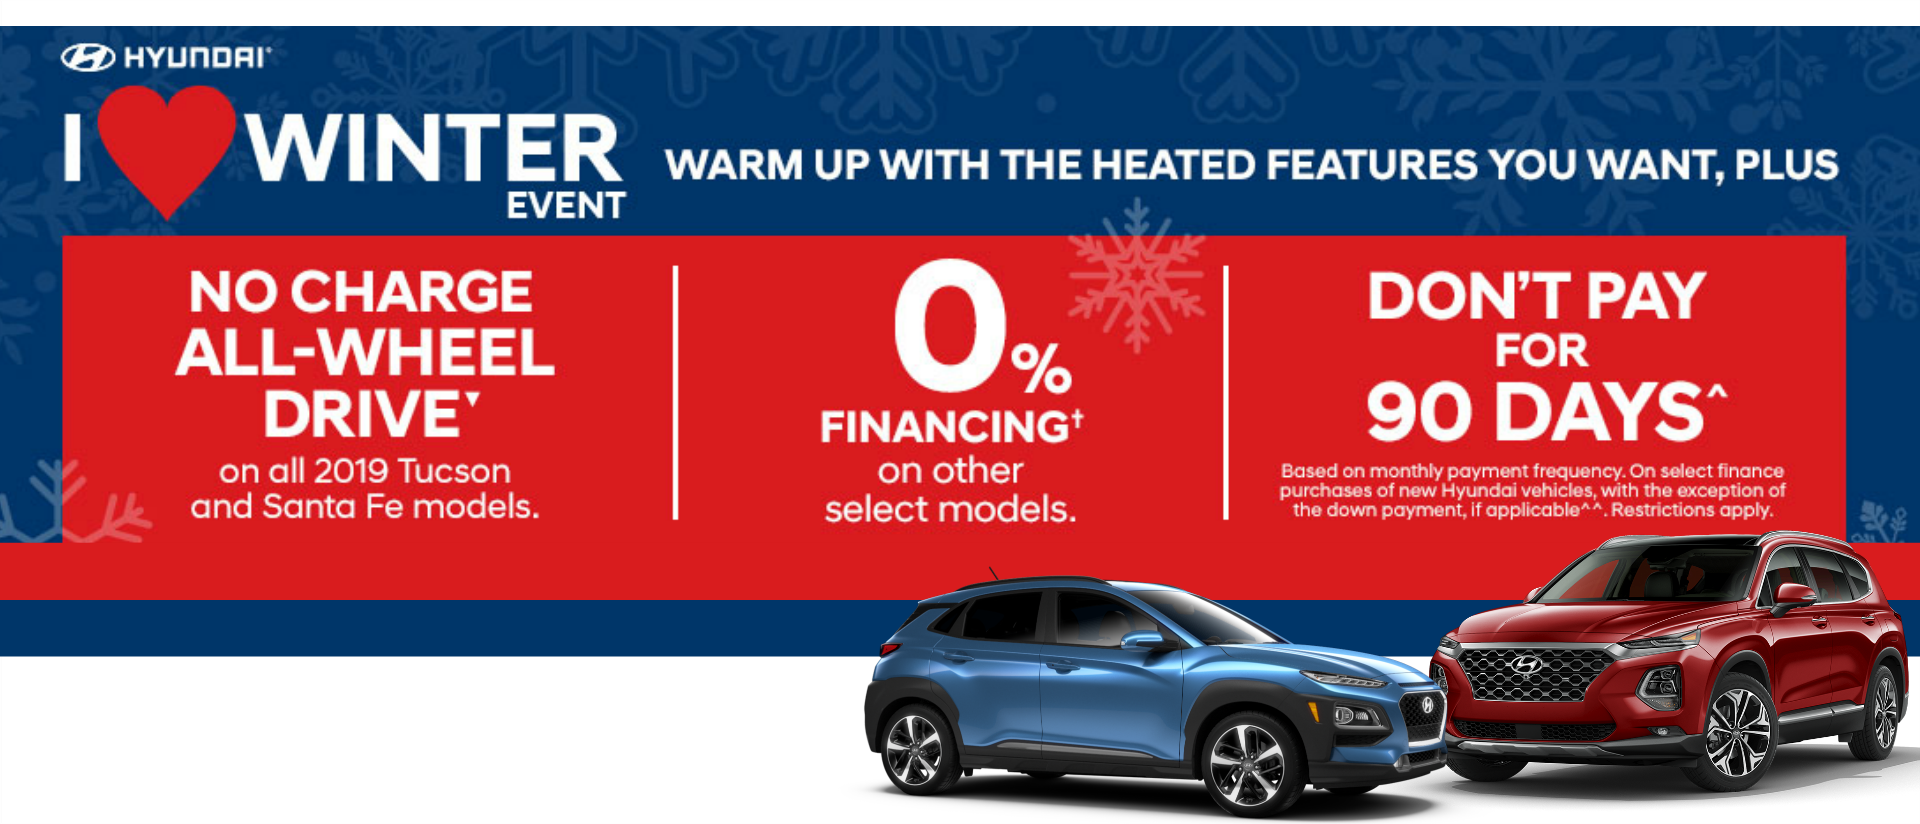 I Love Winter January Sale at Lauria Hyundai